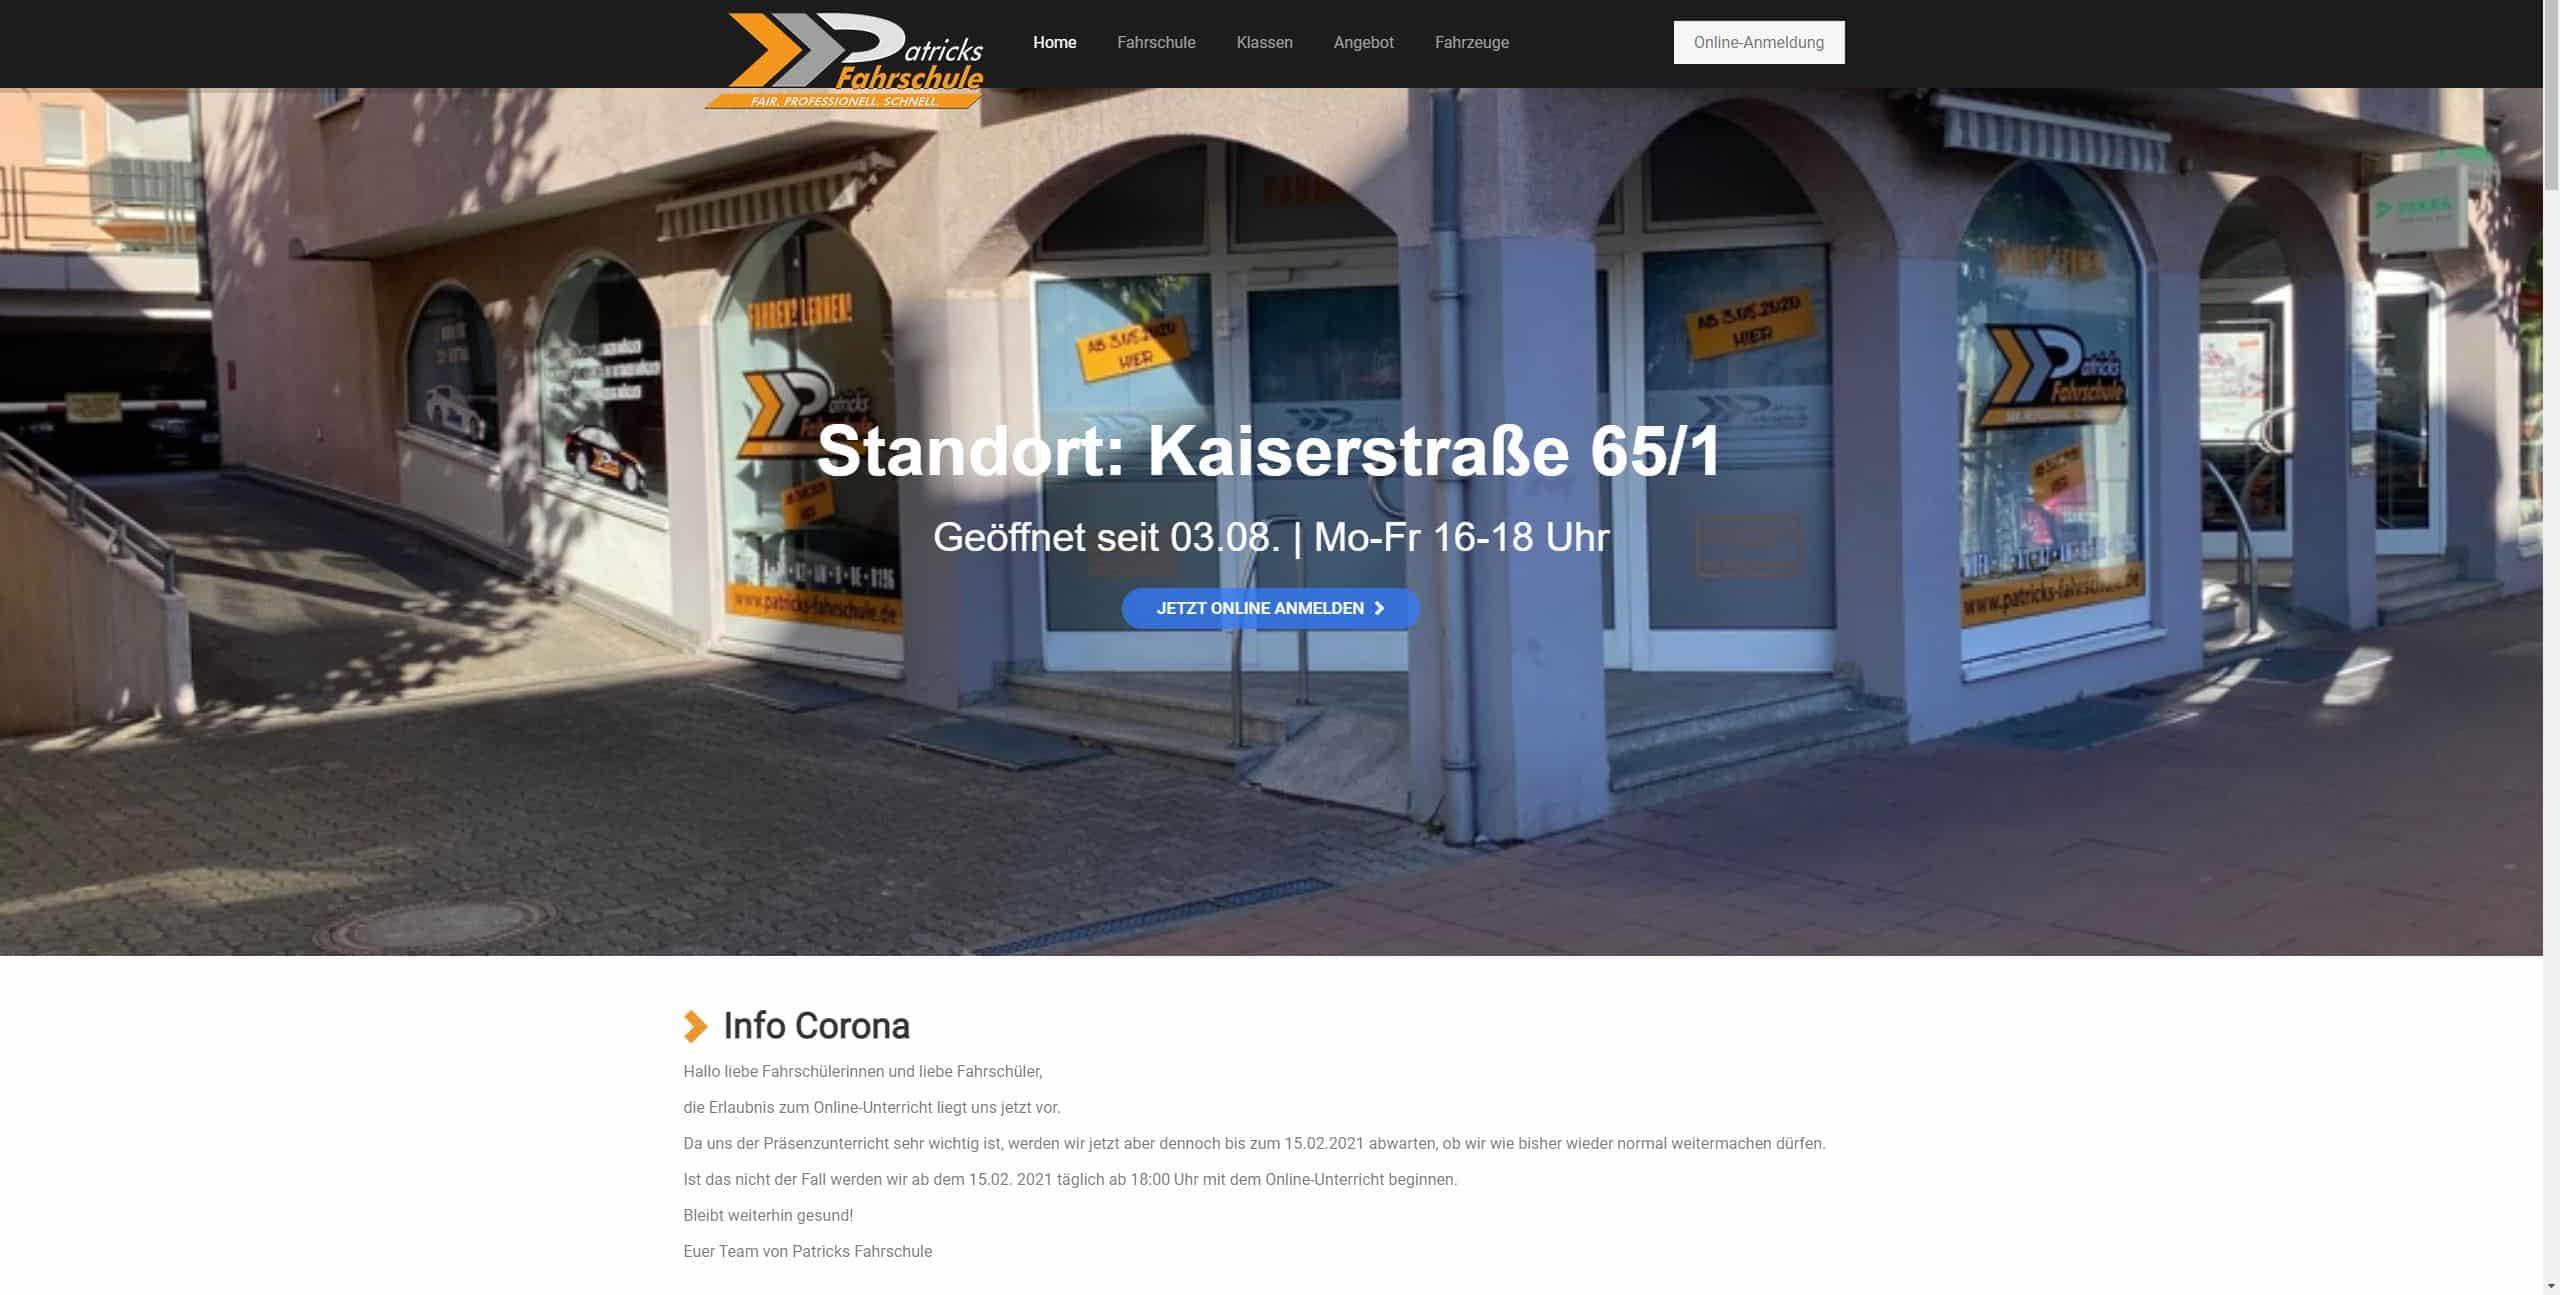 Fahrschule Webseite